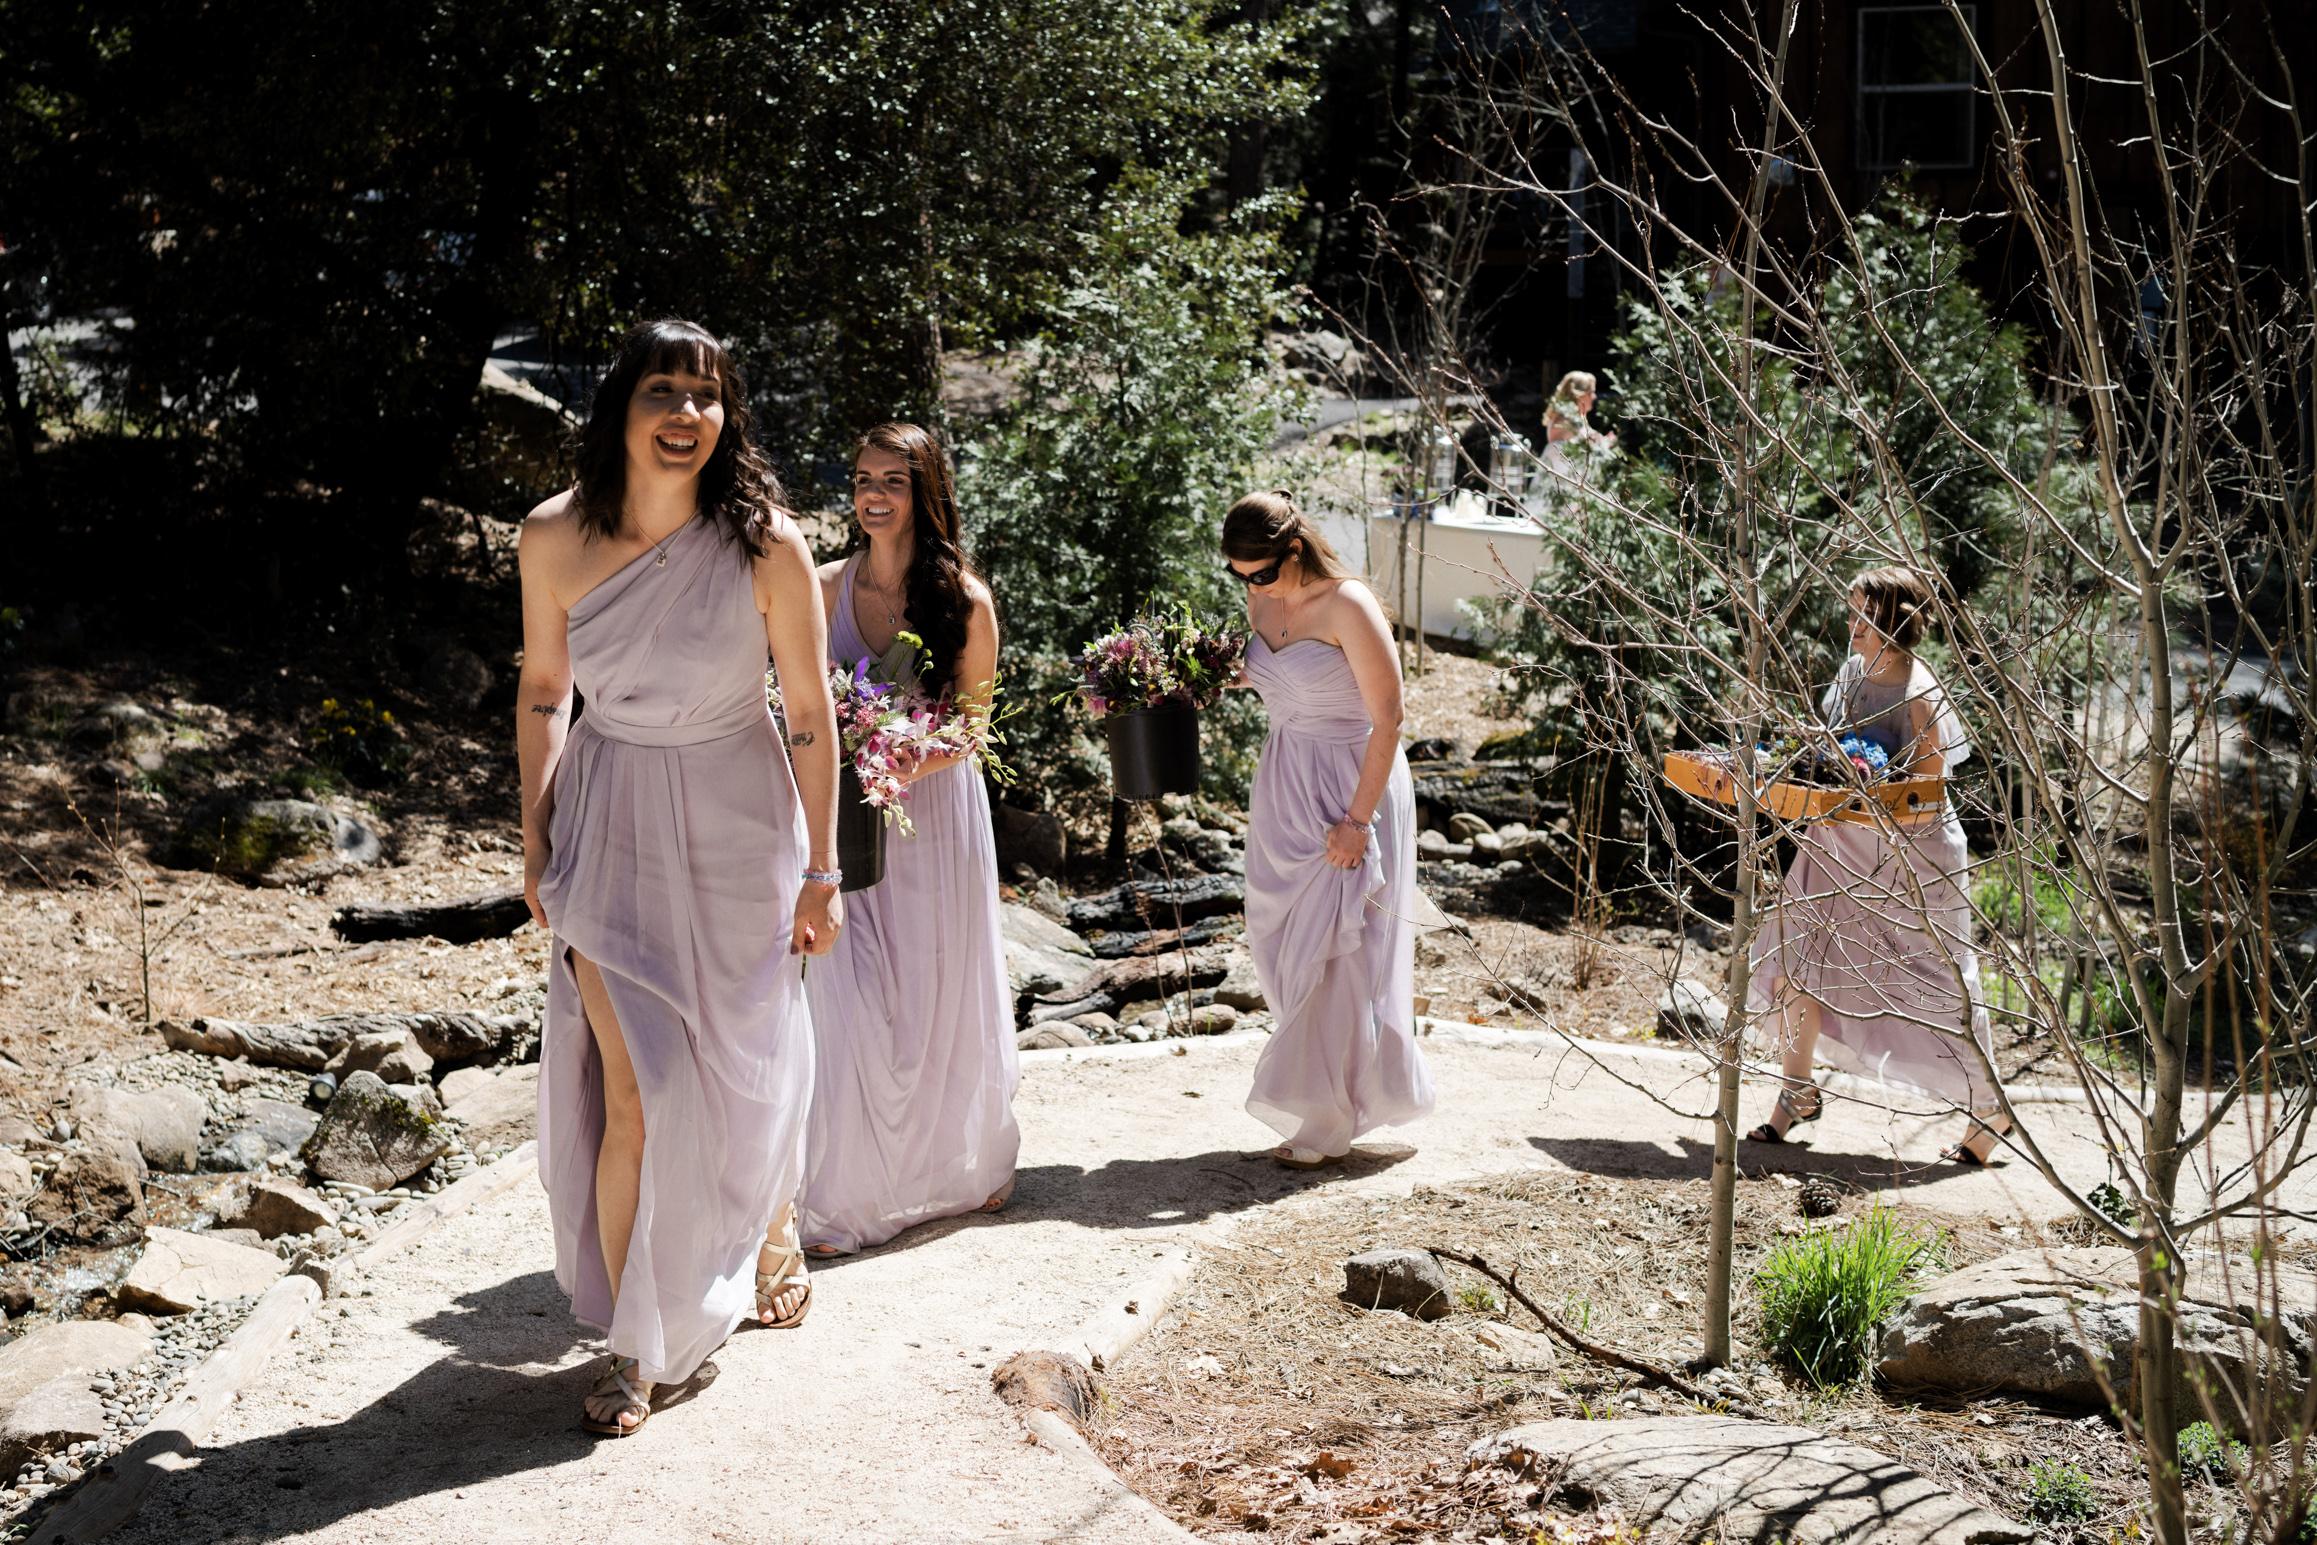 yosemite-evergreen-lodge-wedding-emilychris (189).jpg